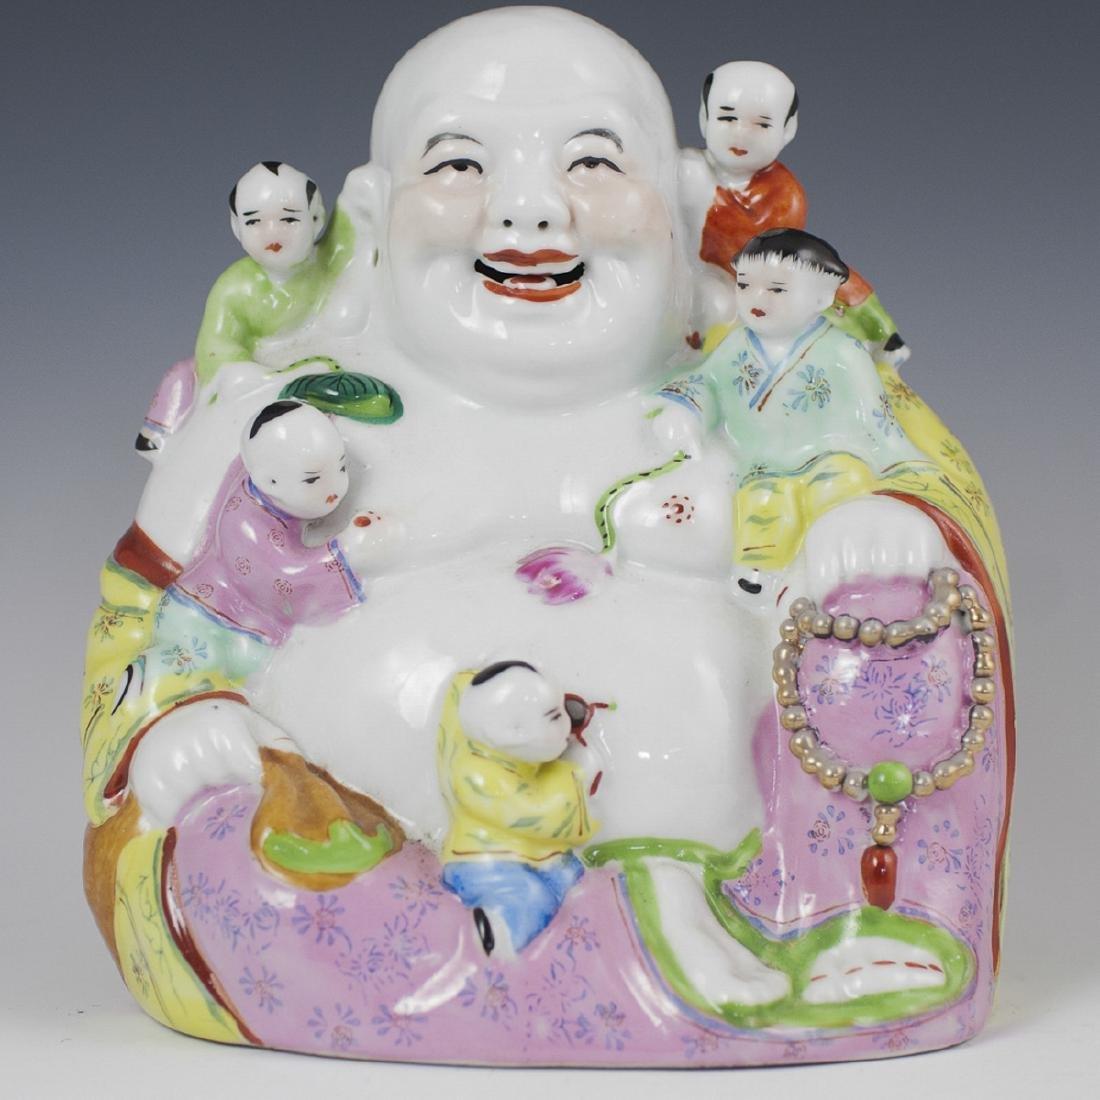 Vintage Chinese Porcelain Laughing Buddha